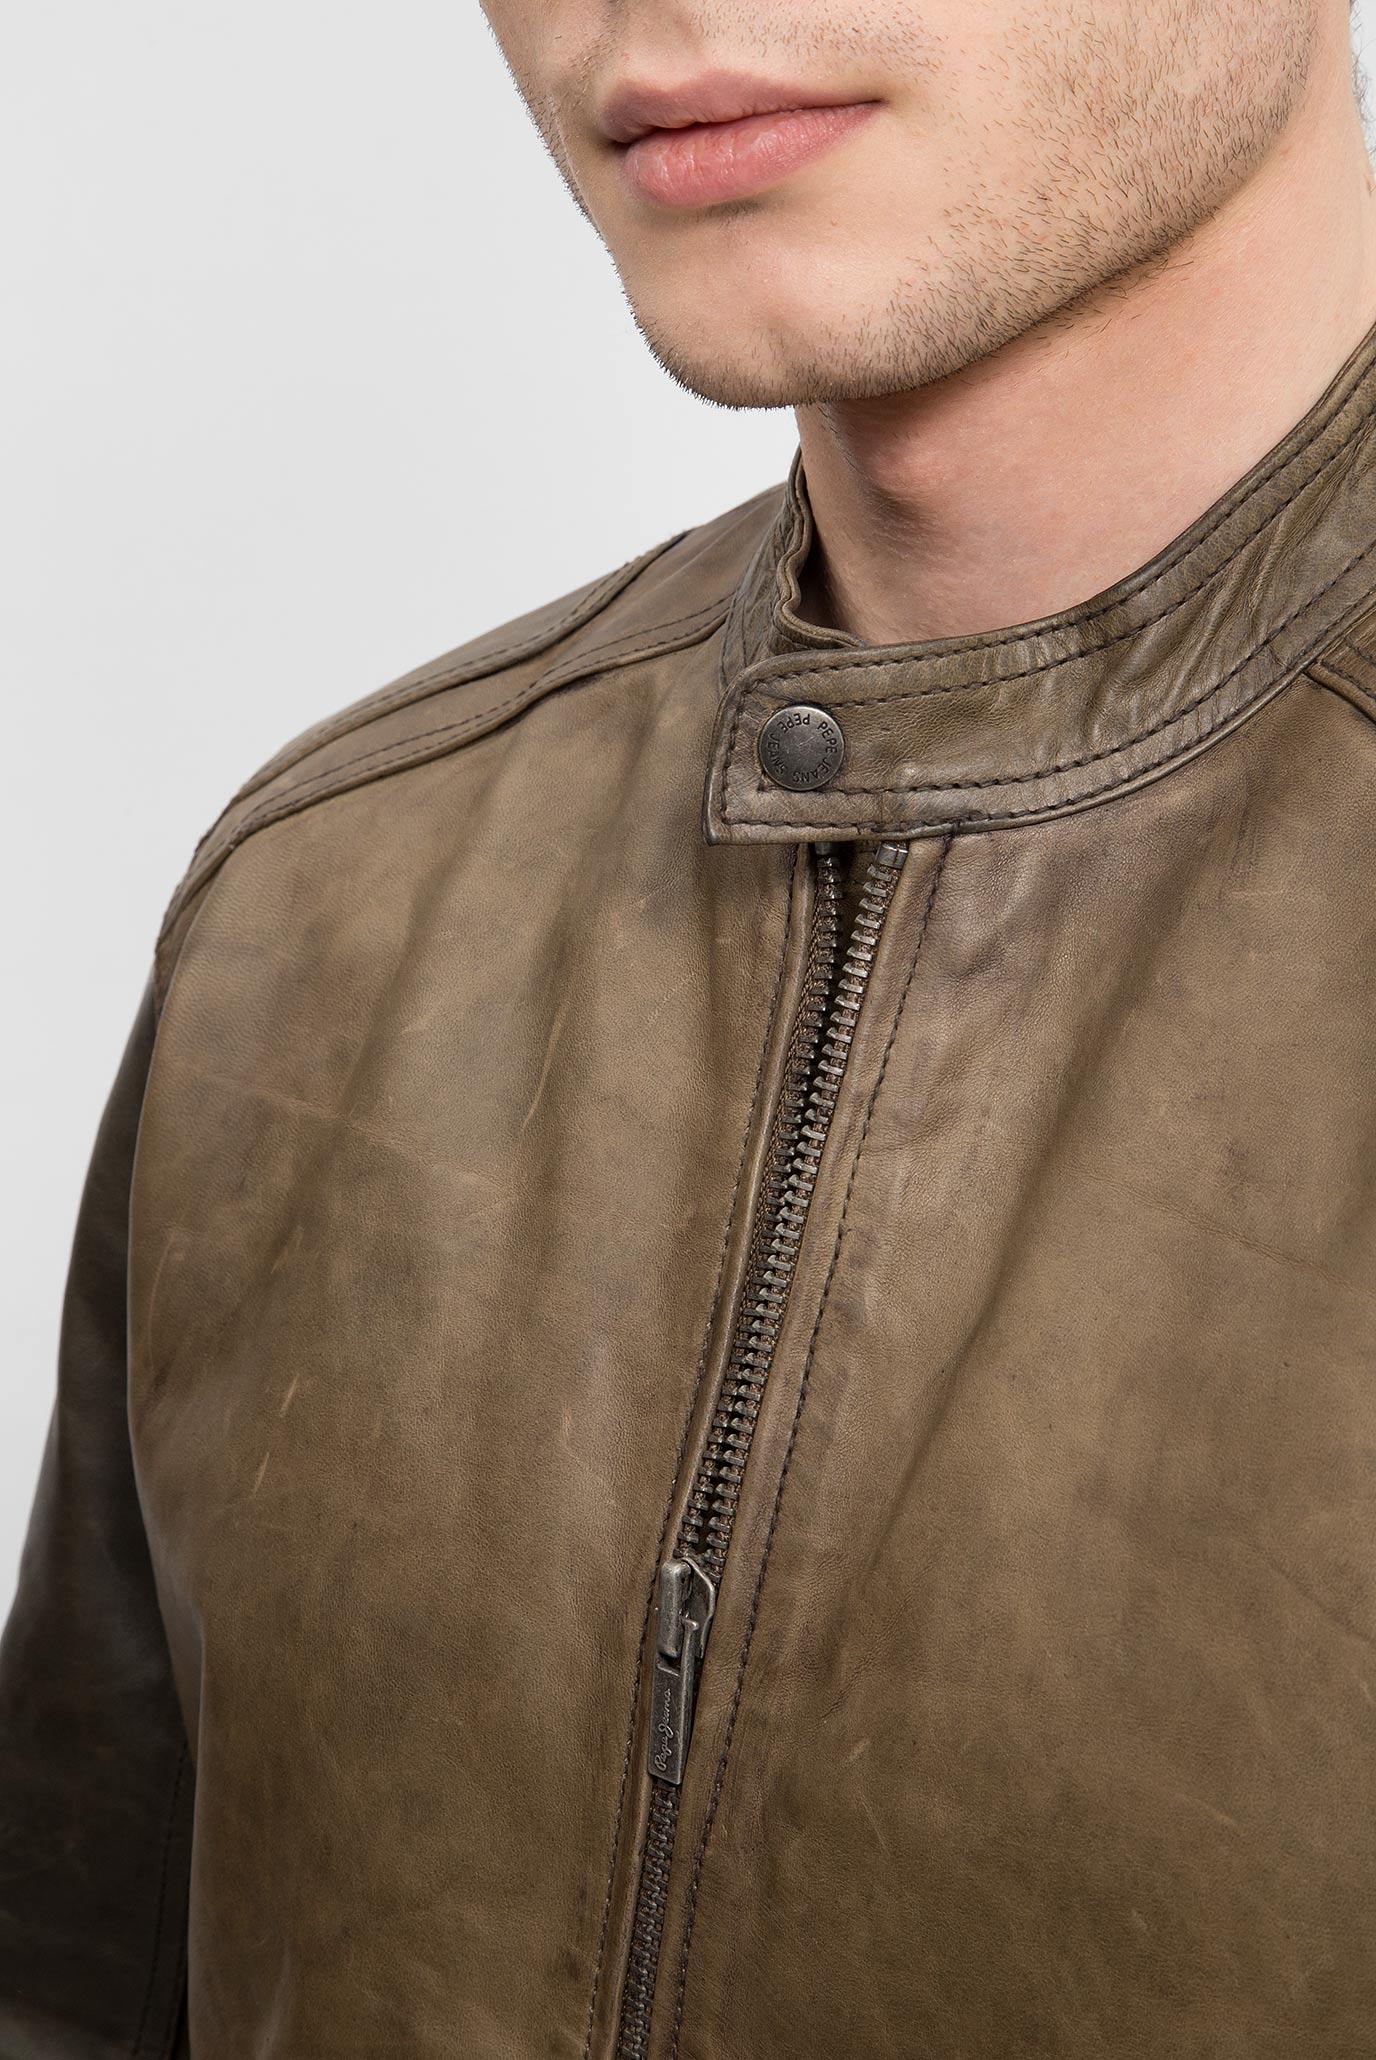 d4541a17c2c Купить Мужская коричневая кожаная куртка VINCENT Pepe Jeans Pepe Jeans  PM401502 – Киев